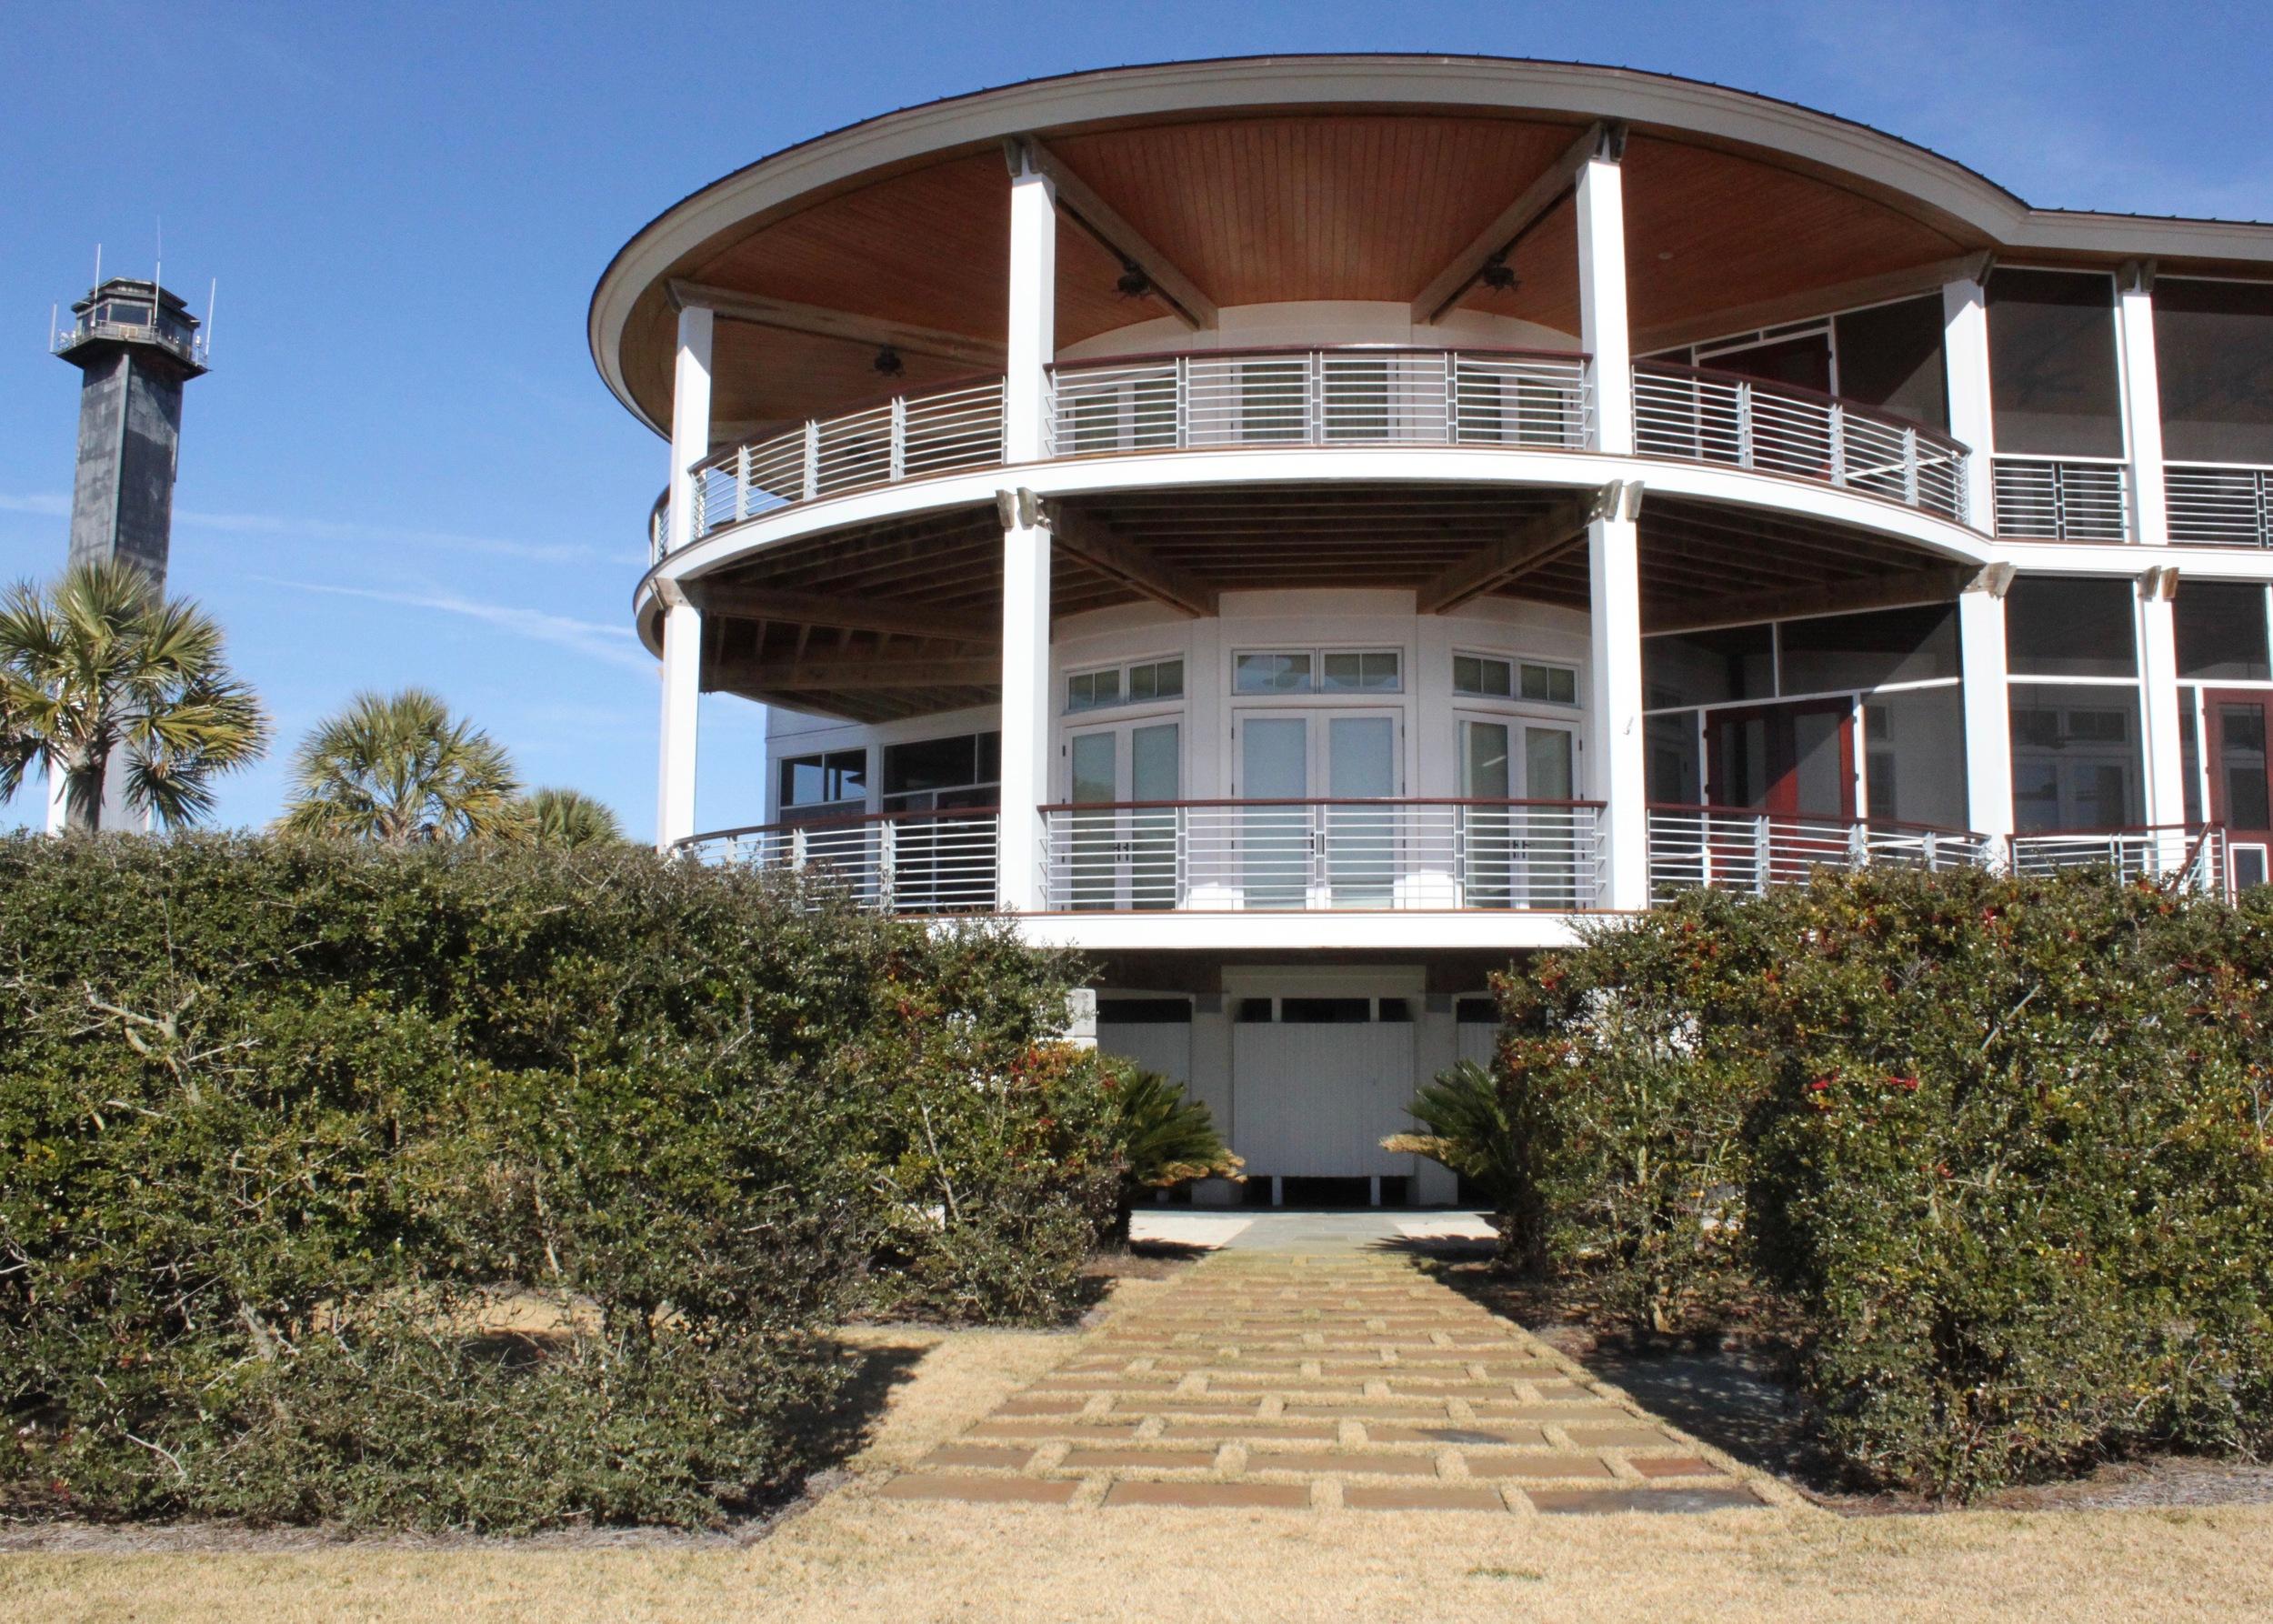 Sullivan's Island Beachfront Residence